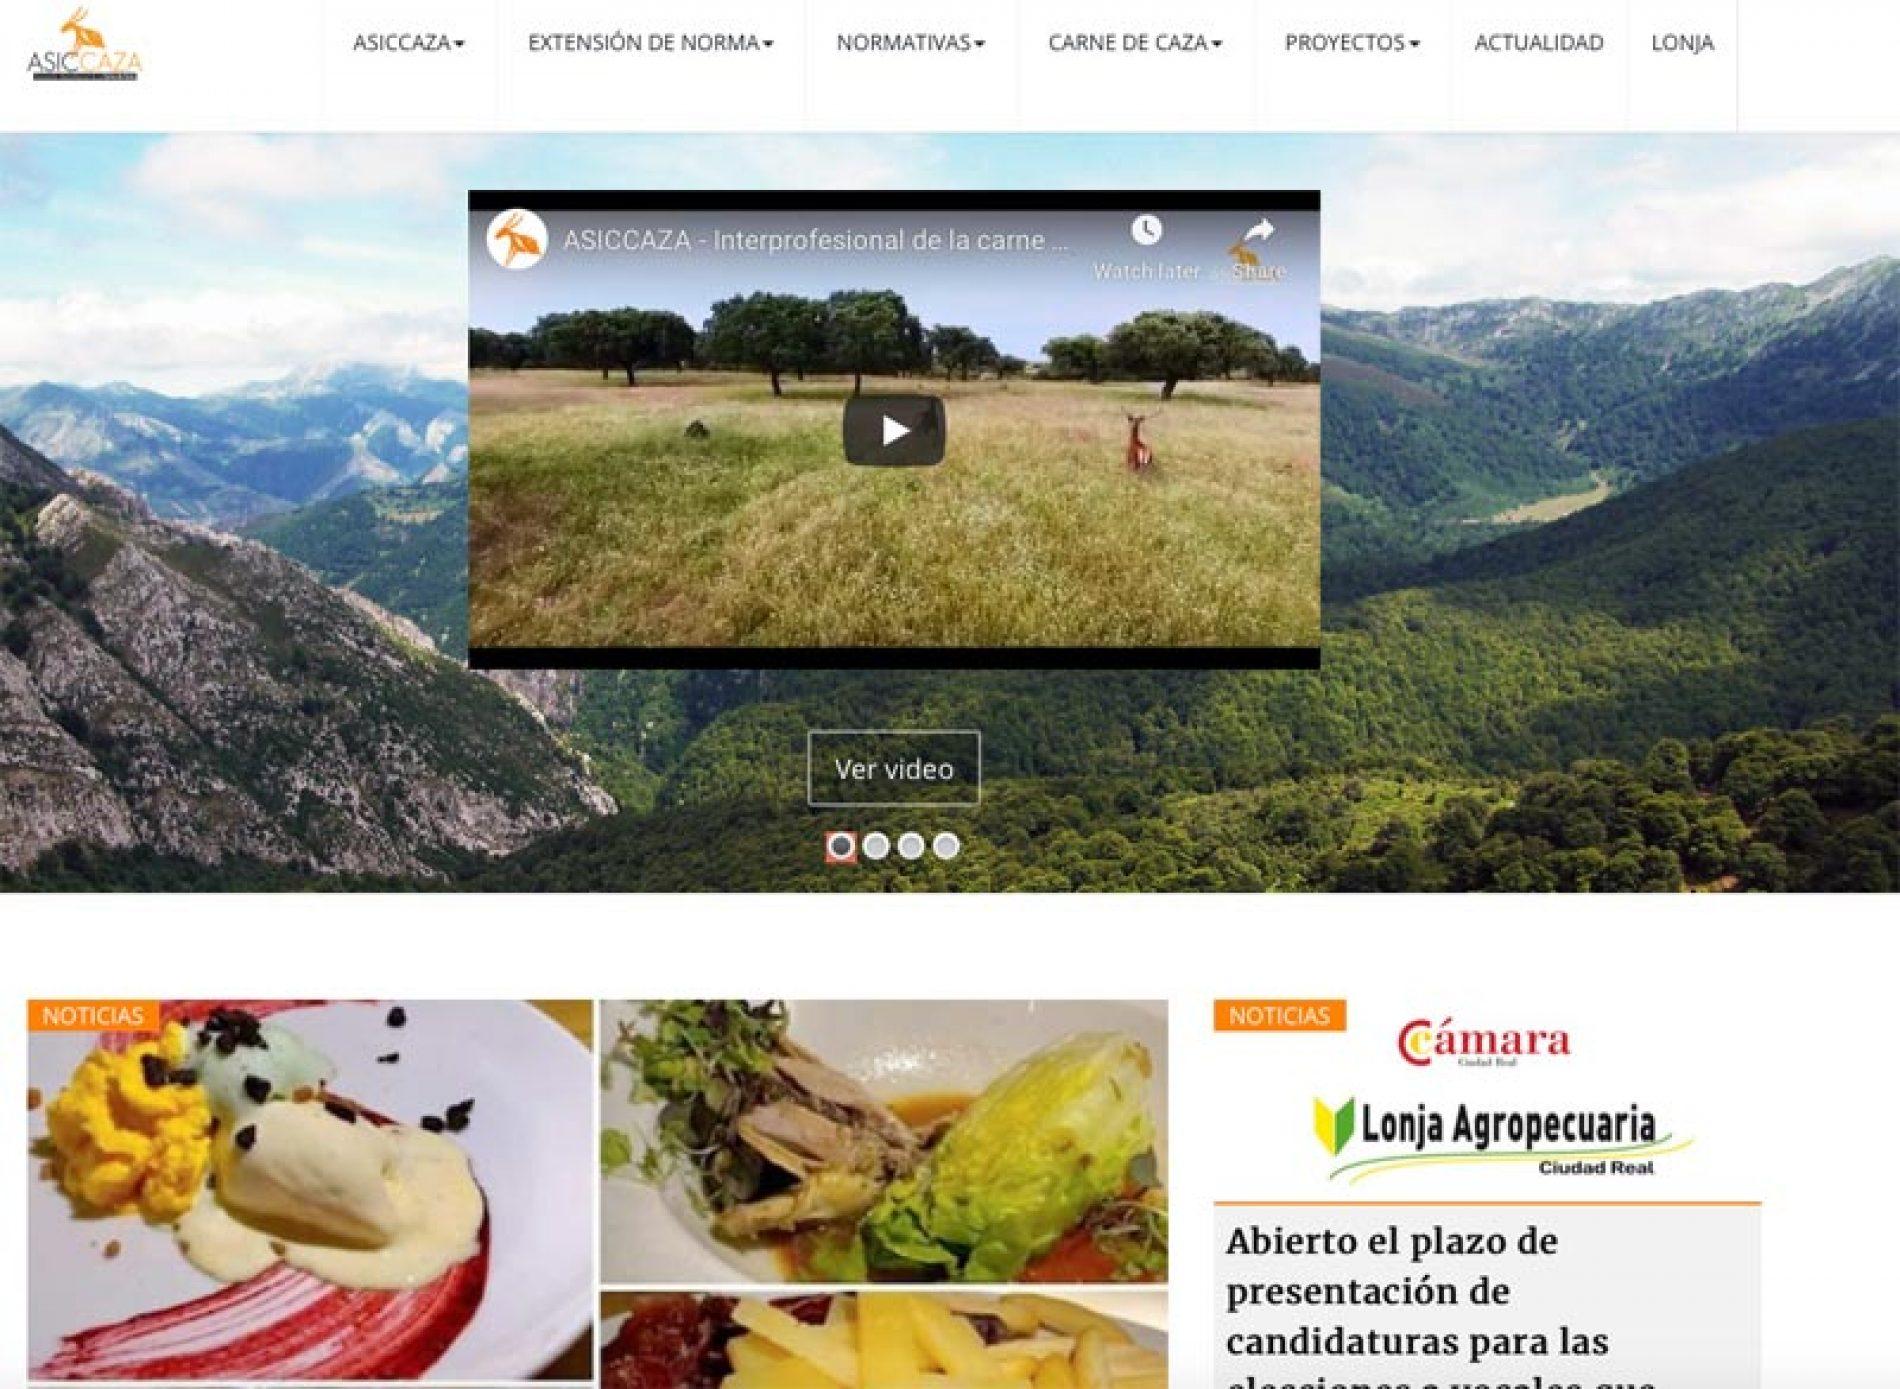 ASICCAZA presenta su nueva web